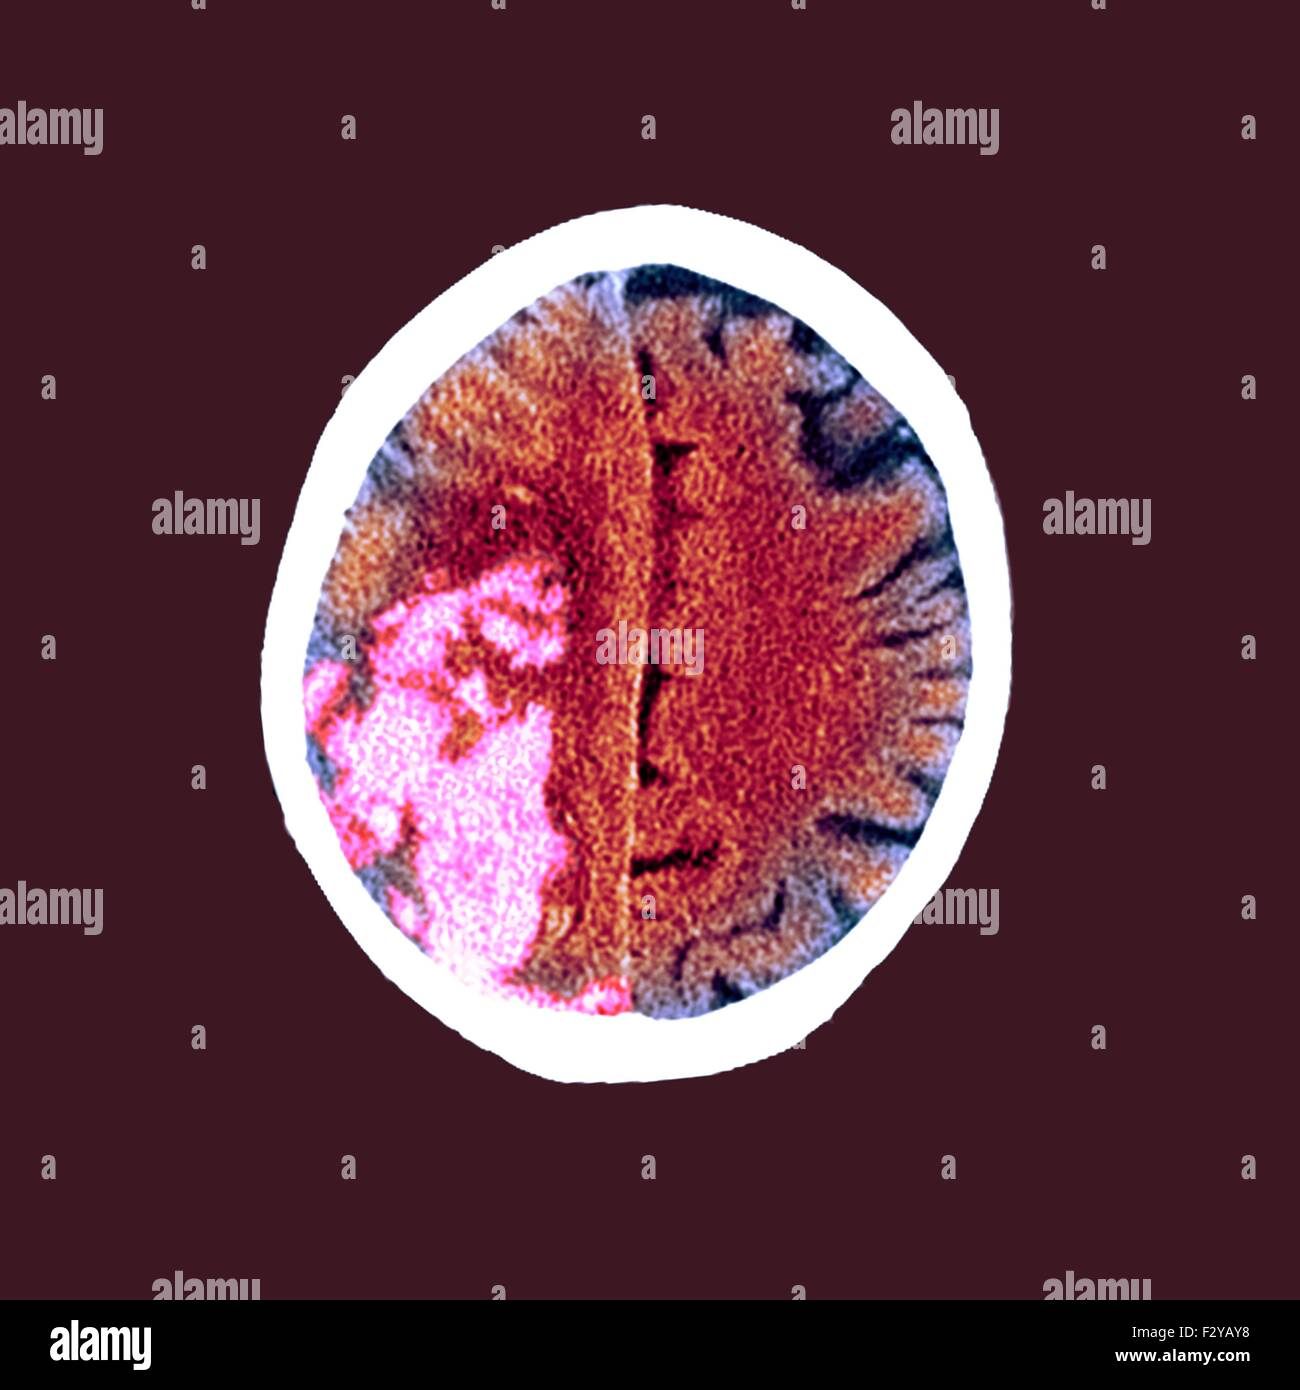 Disease Mri Stockfotos & Disease Mri Bilder - Seite 3 - Alamy